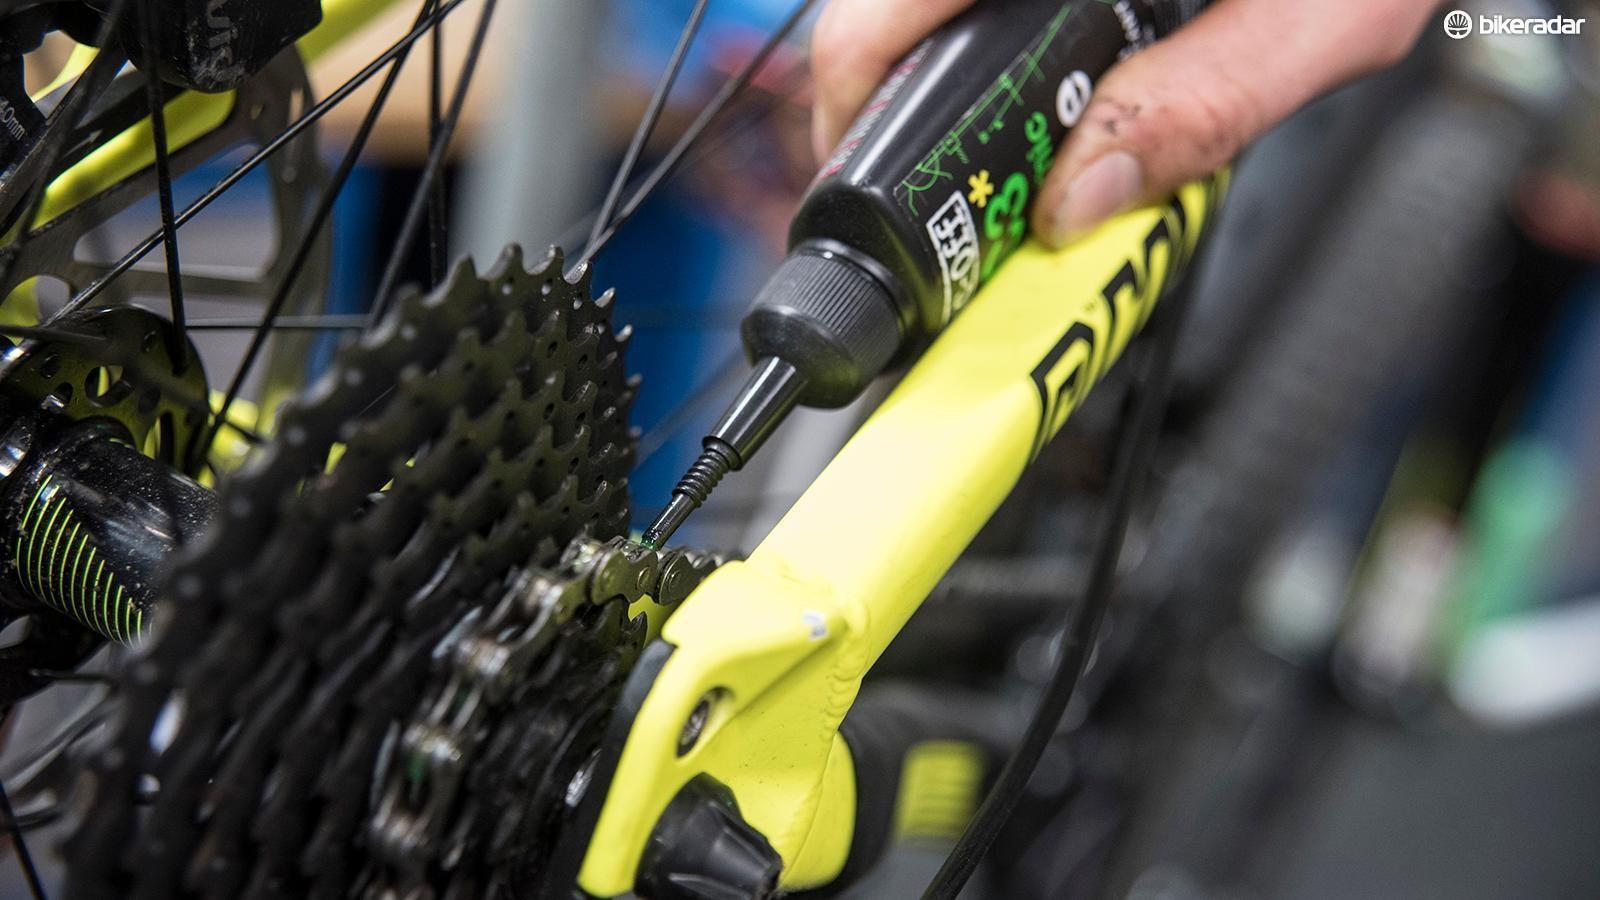 Lubricate your bike's chain